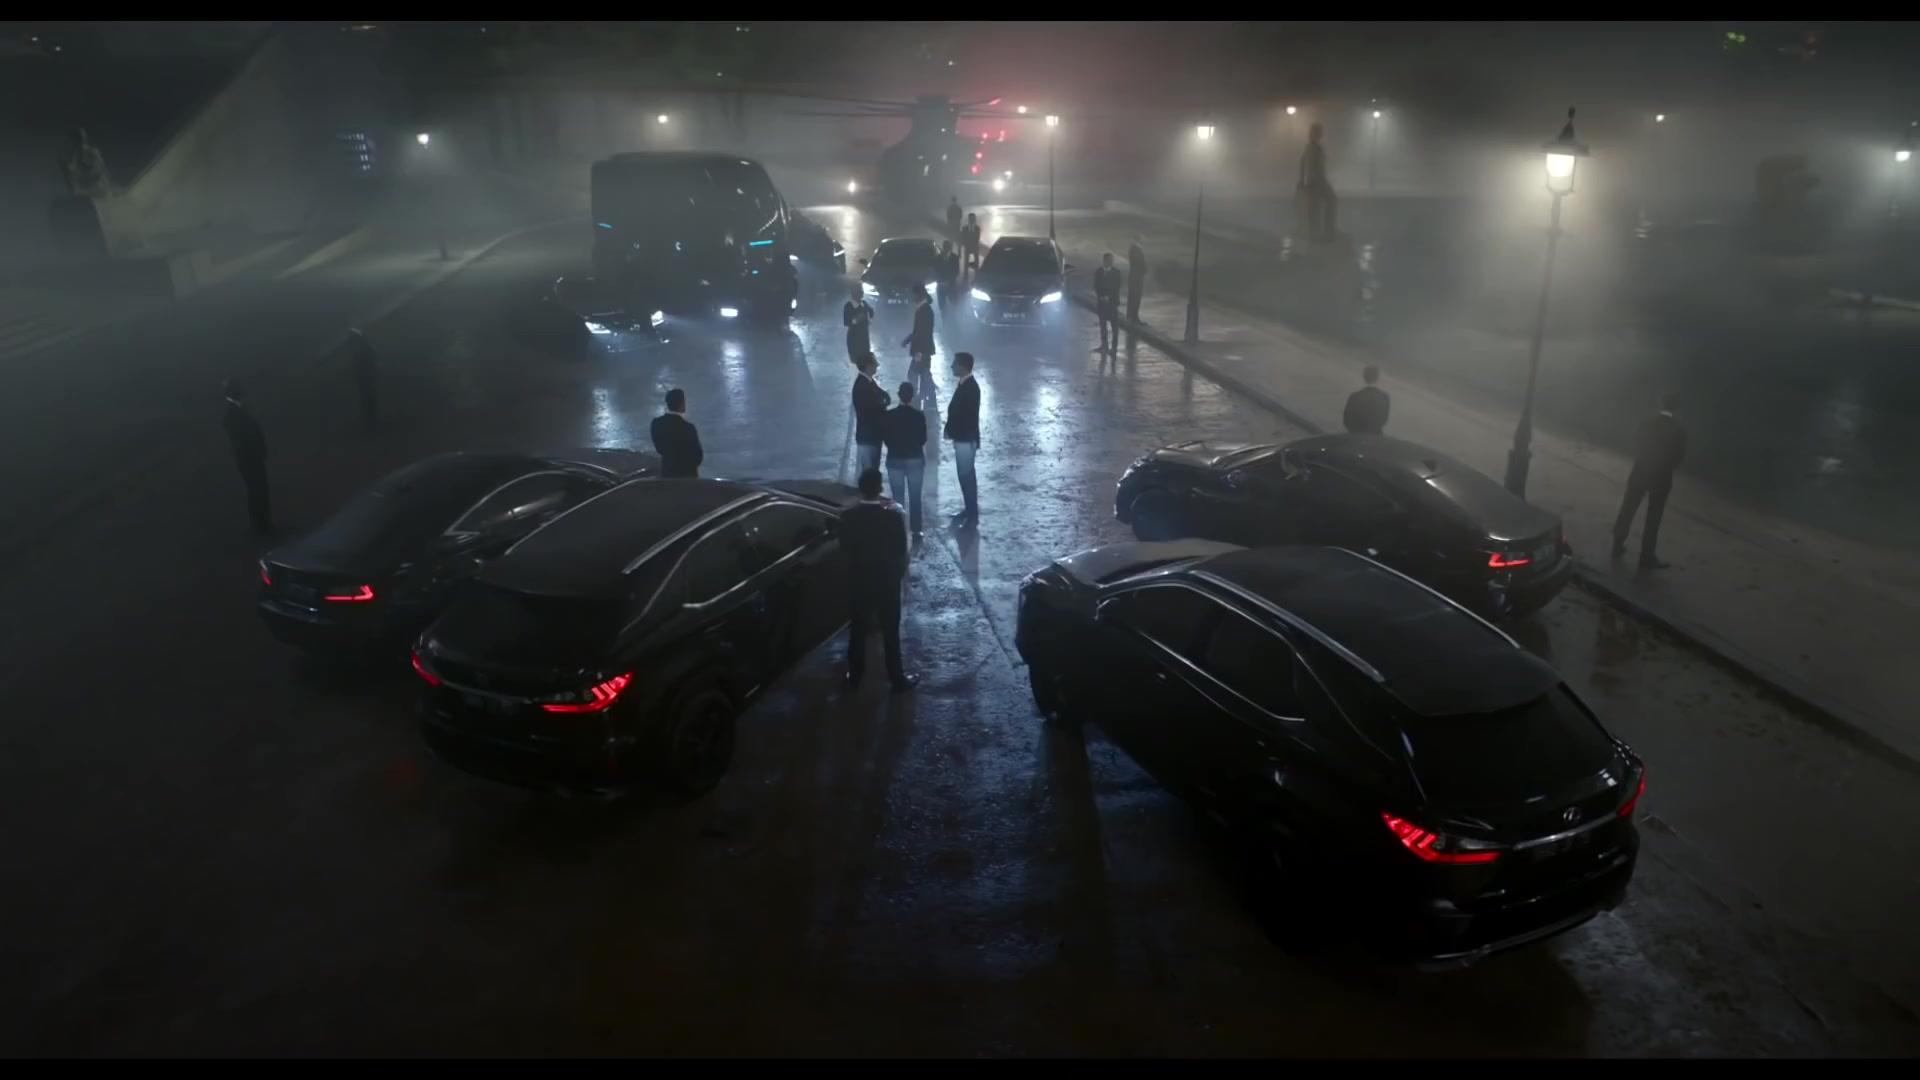 Infiniti Qx70 Used >> Lexus Cars in Men in Black: International (2019) Movie